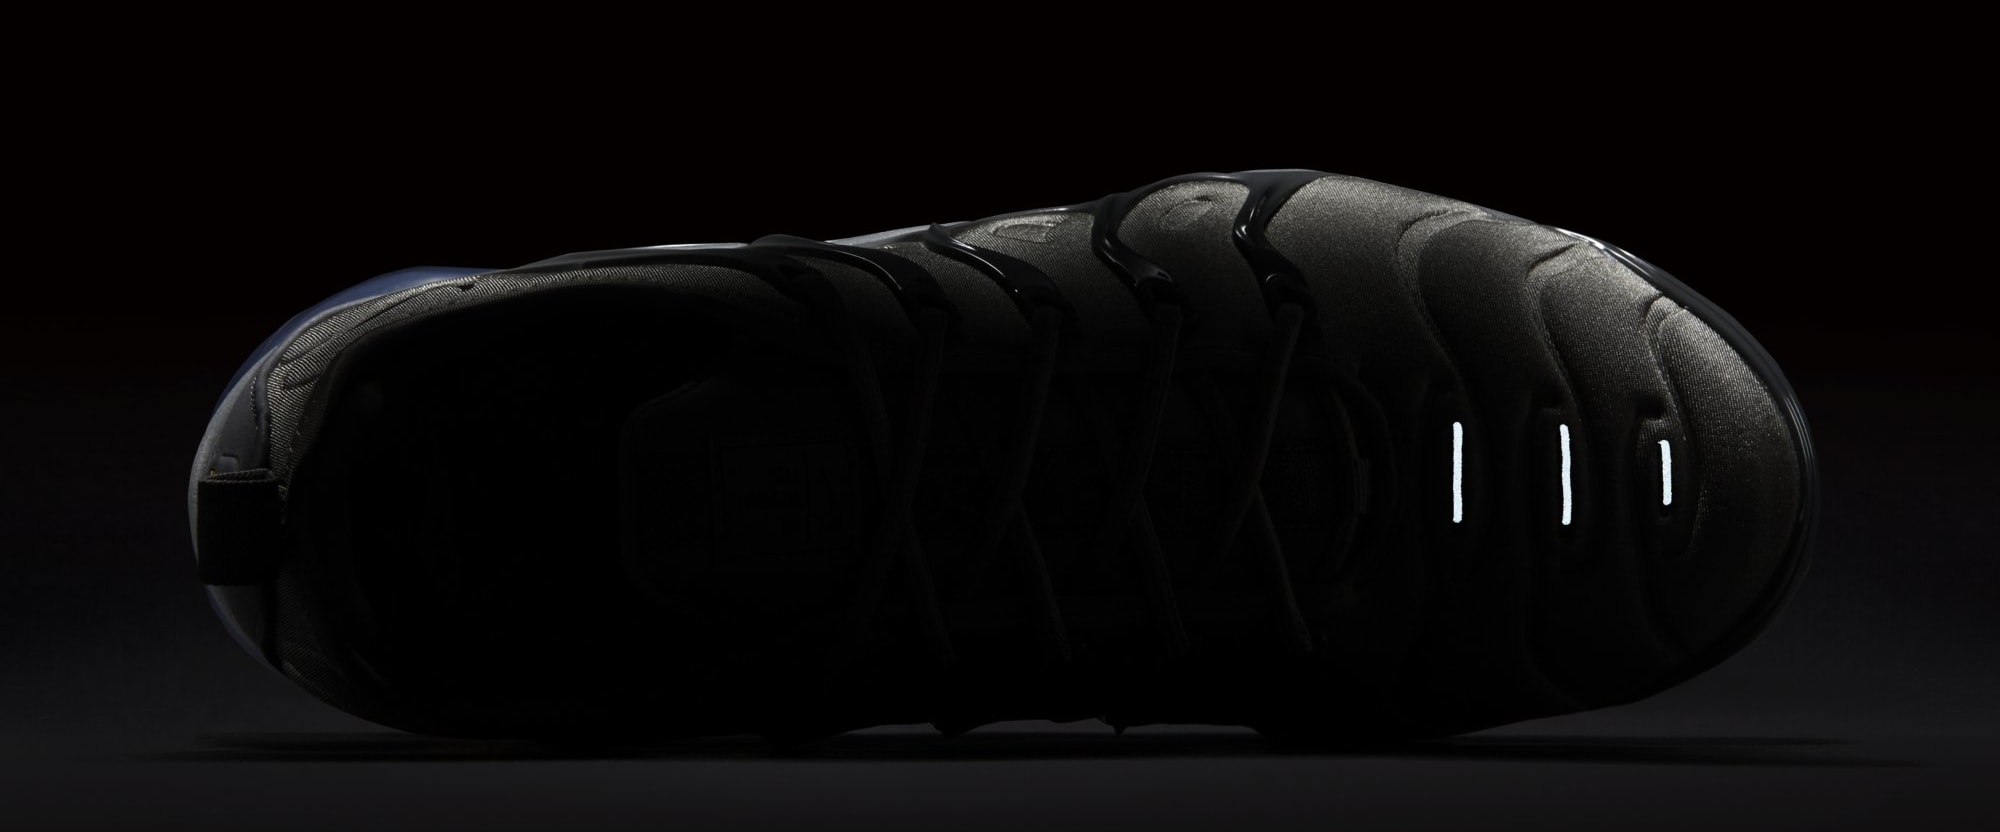 new style 3e027 6d874 Image via Nike Nike VaporMax Plus  Dark Stucco White Dark Grey Anthracite   AT5681-